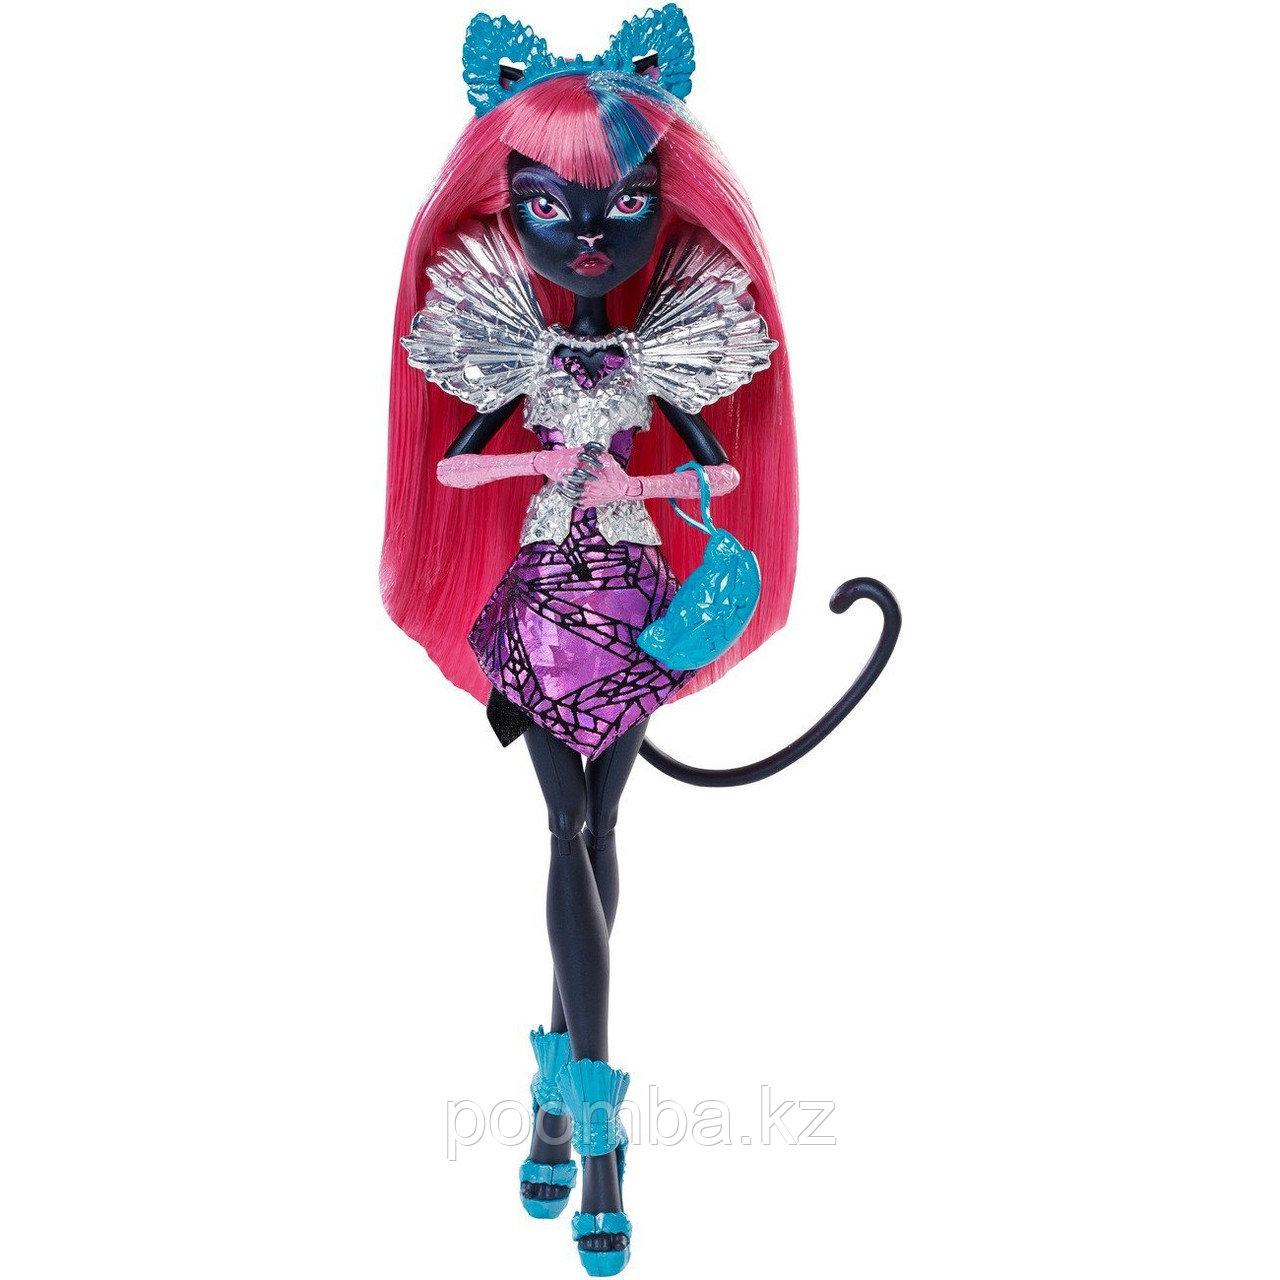 "Кукла Monster High ""Boo York, Boo York"" - Кэтти Нуар"